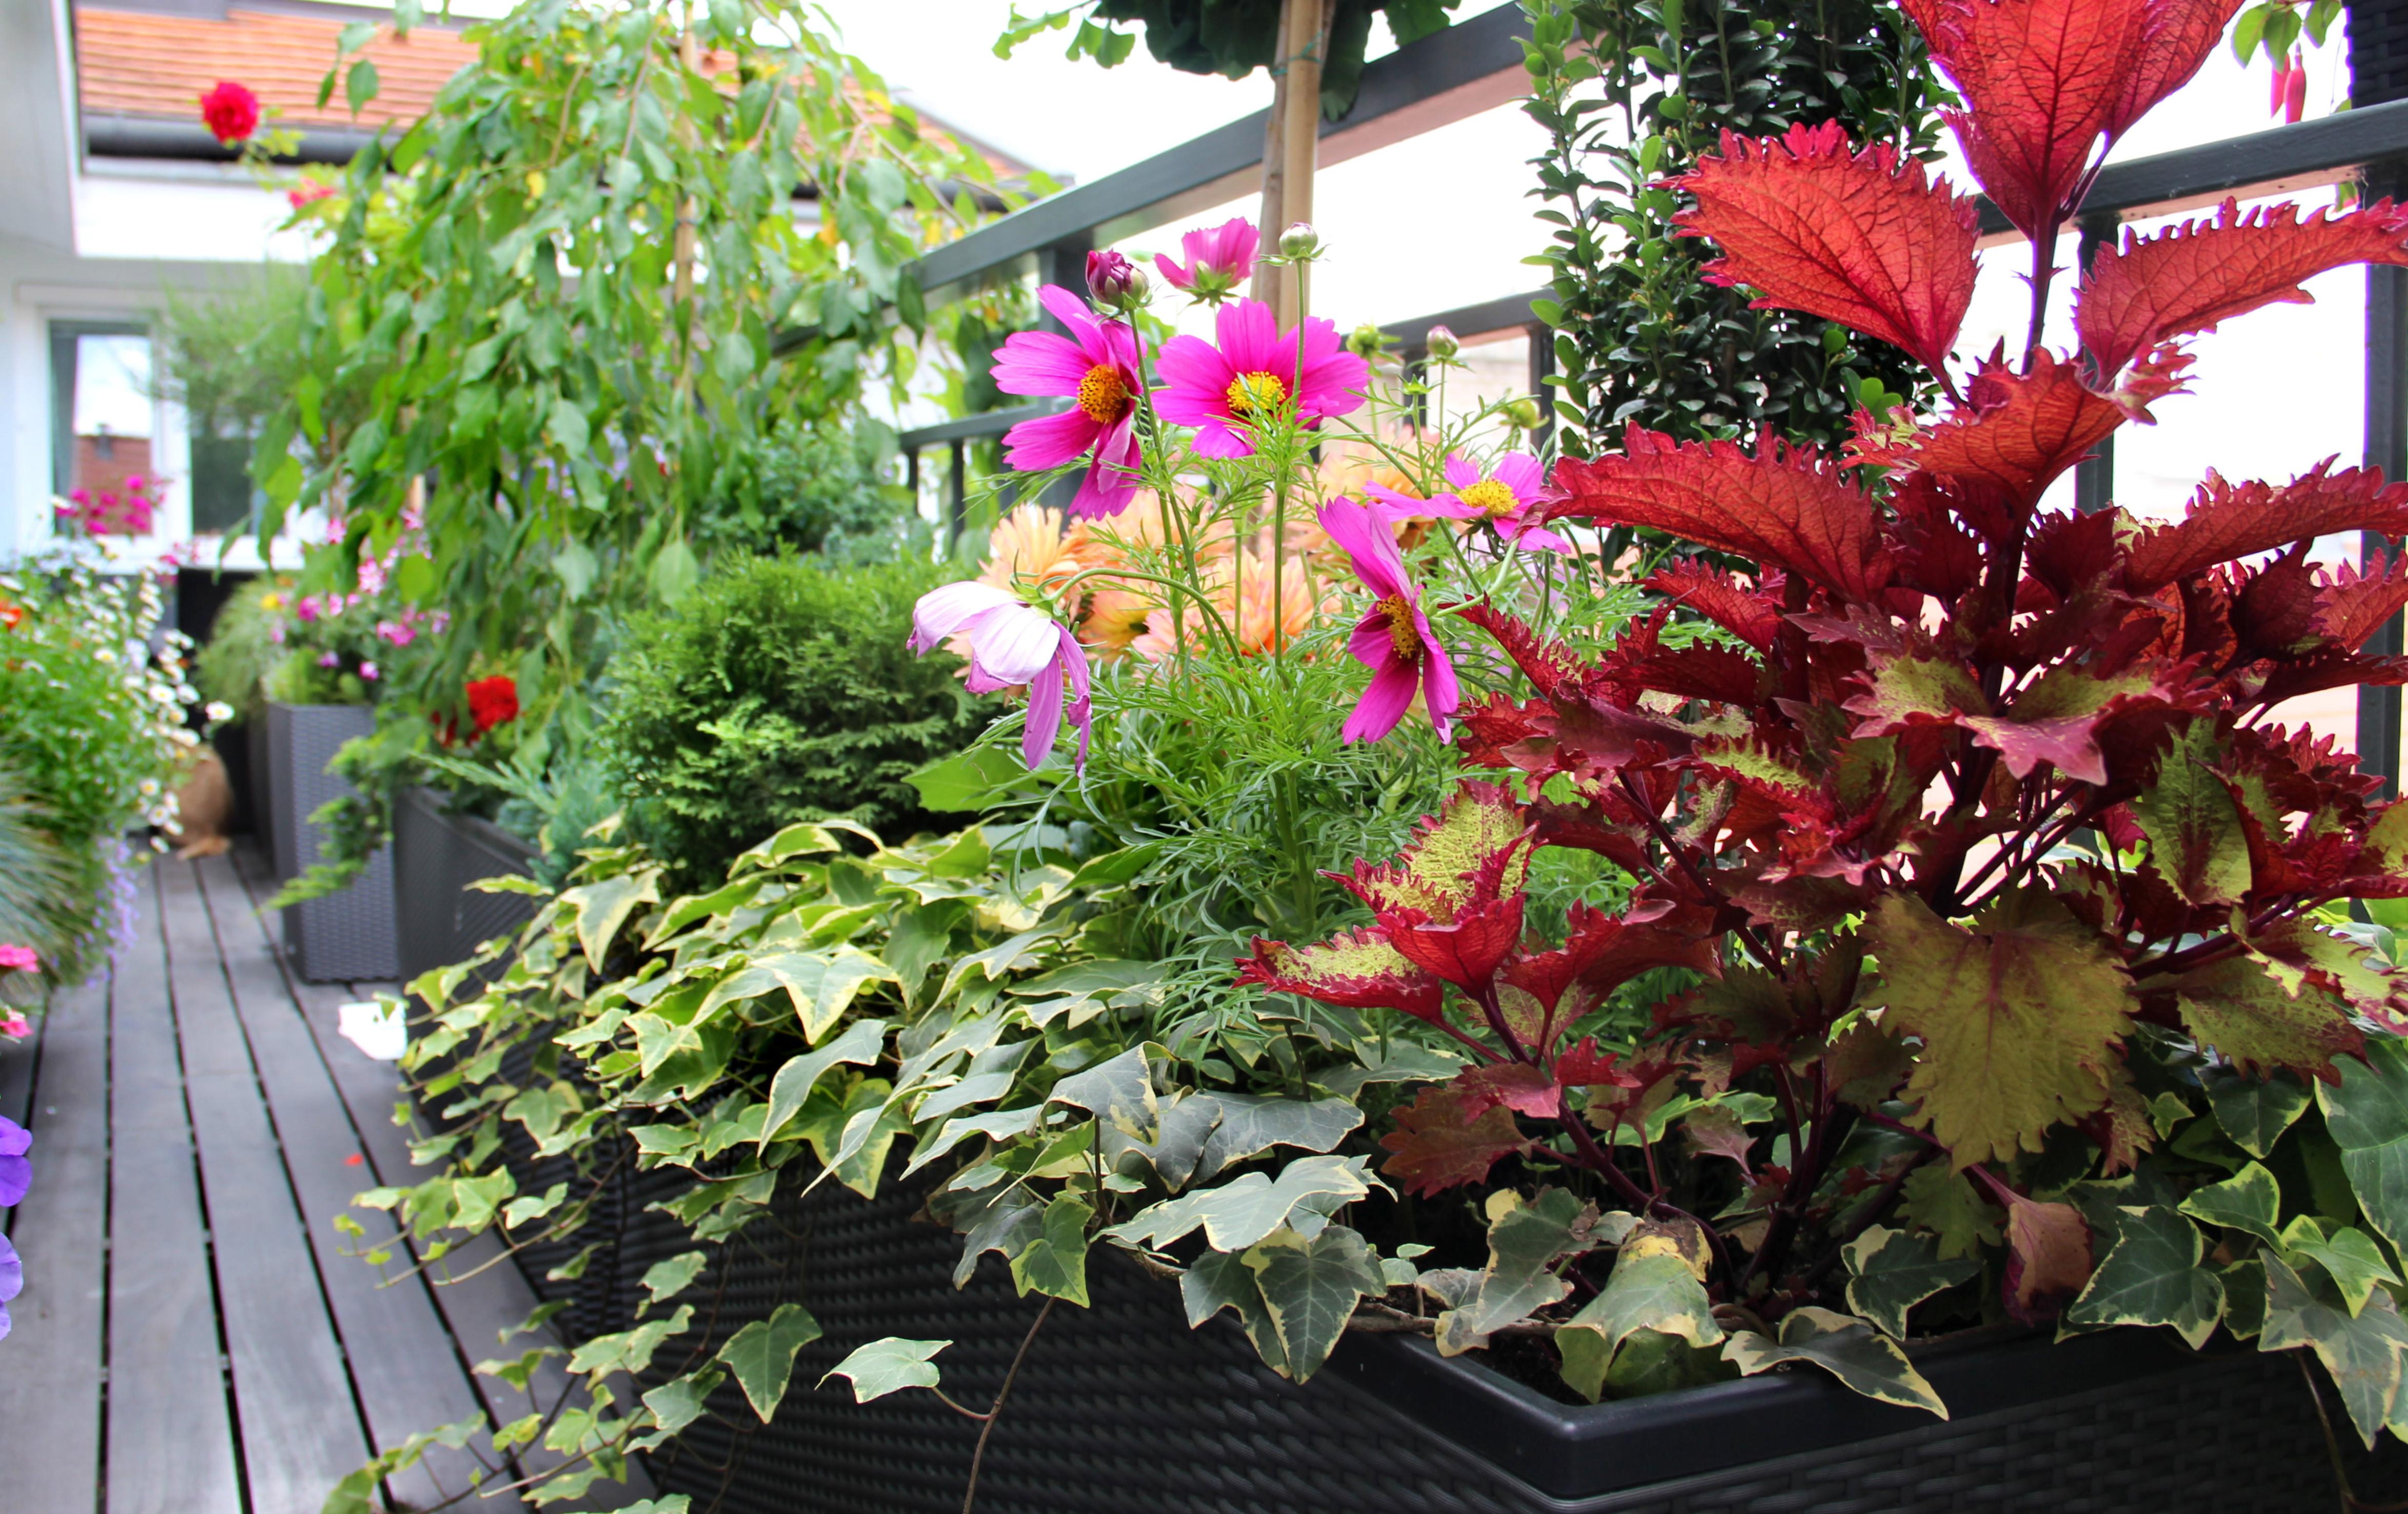 Garden plantings on balcony